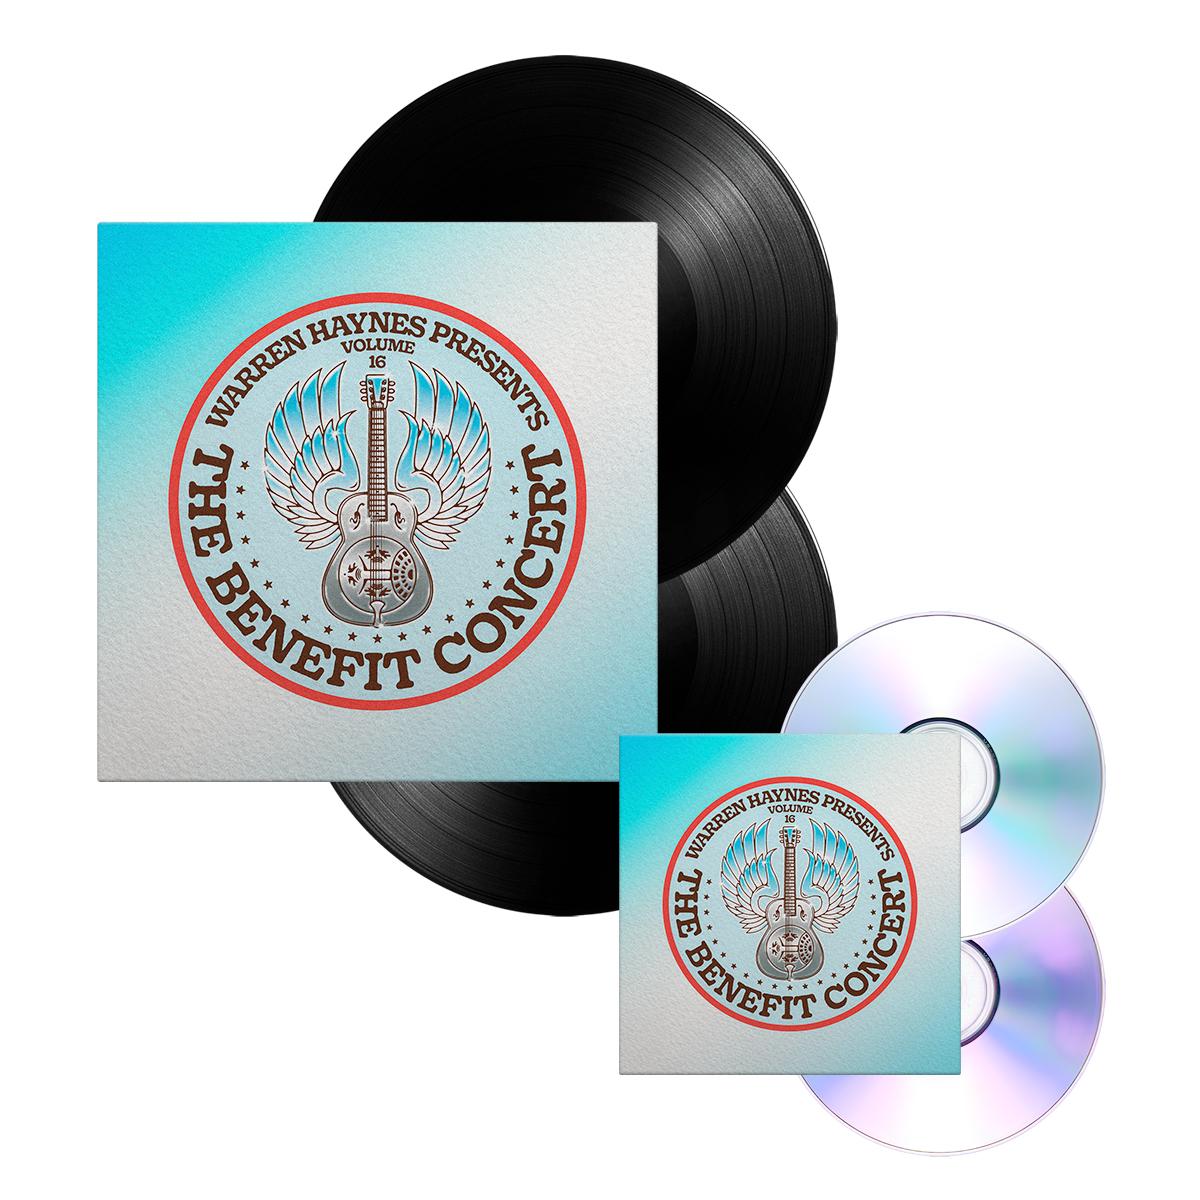 CD/DVD + Double Vinyl Bundle: The Benefit Concert  V. 16